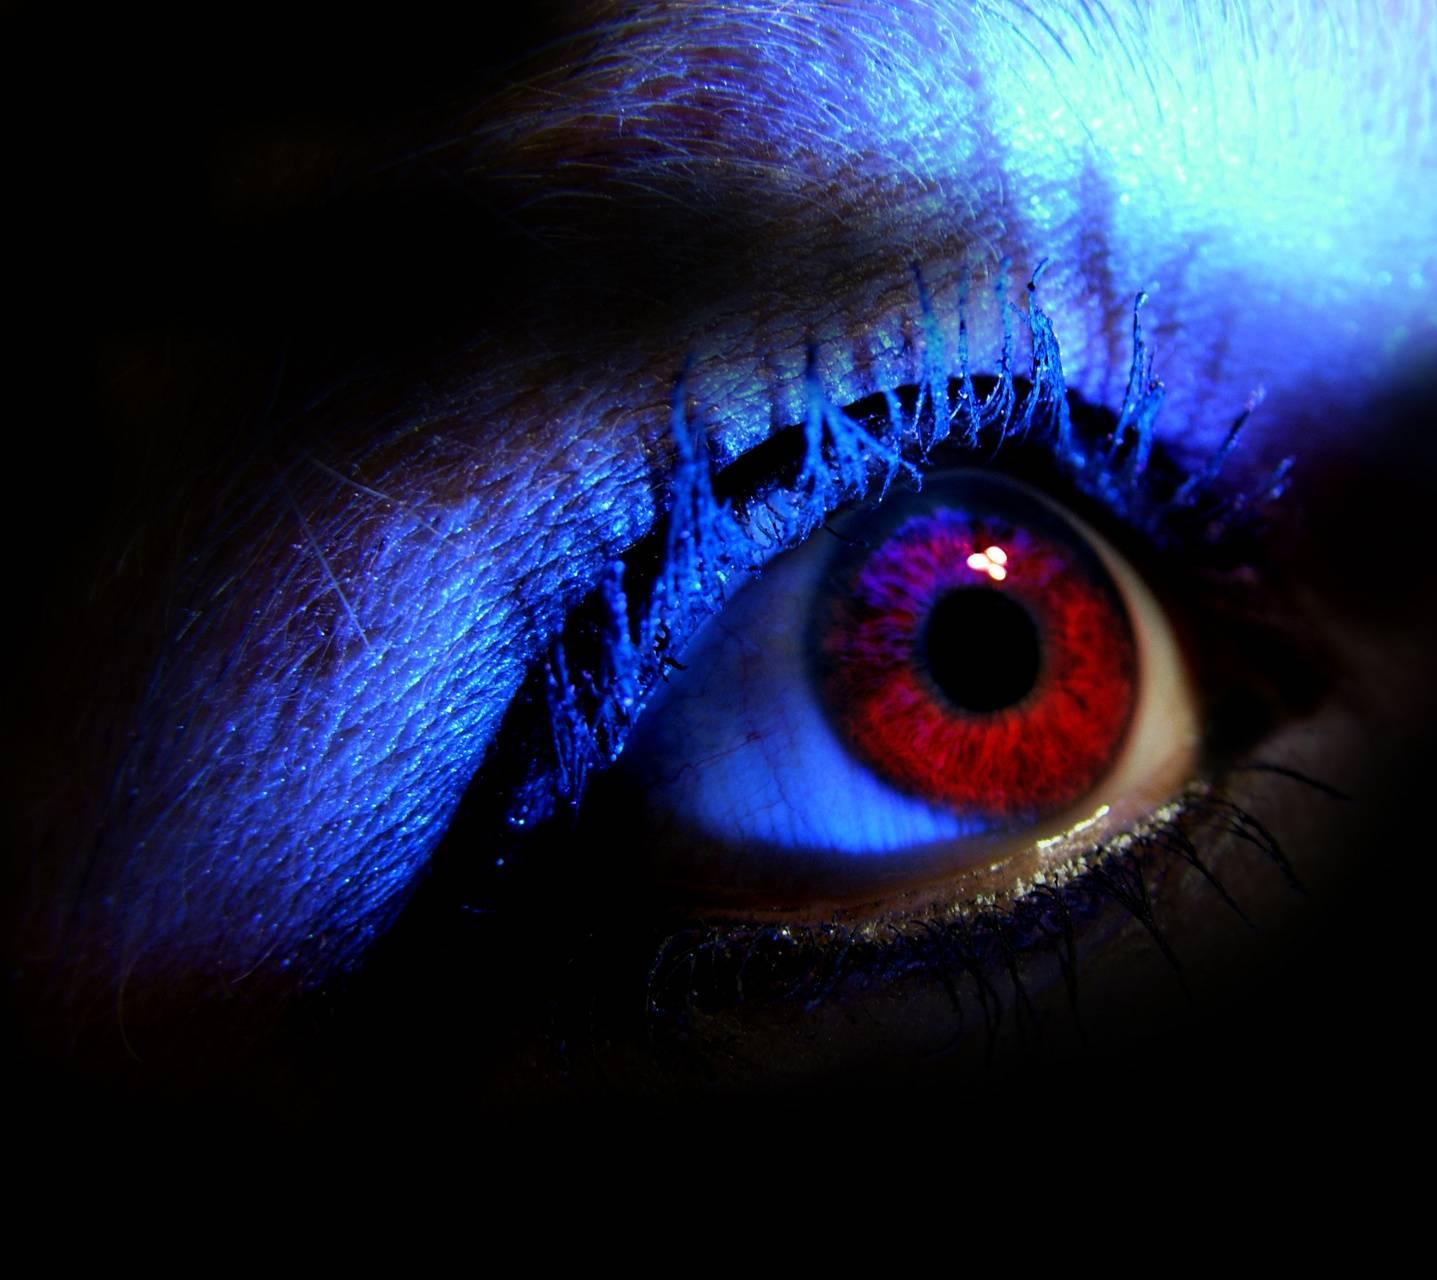 Abstract Eye3